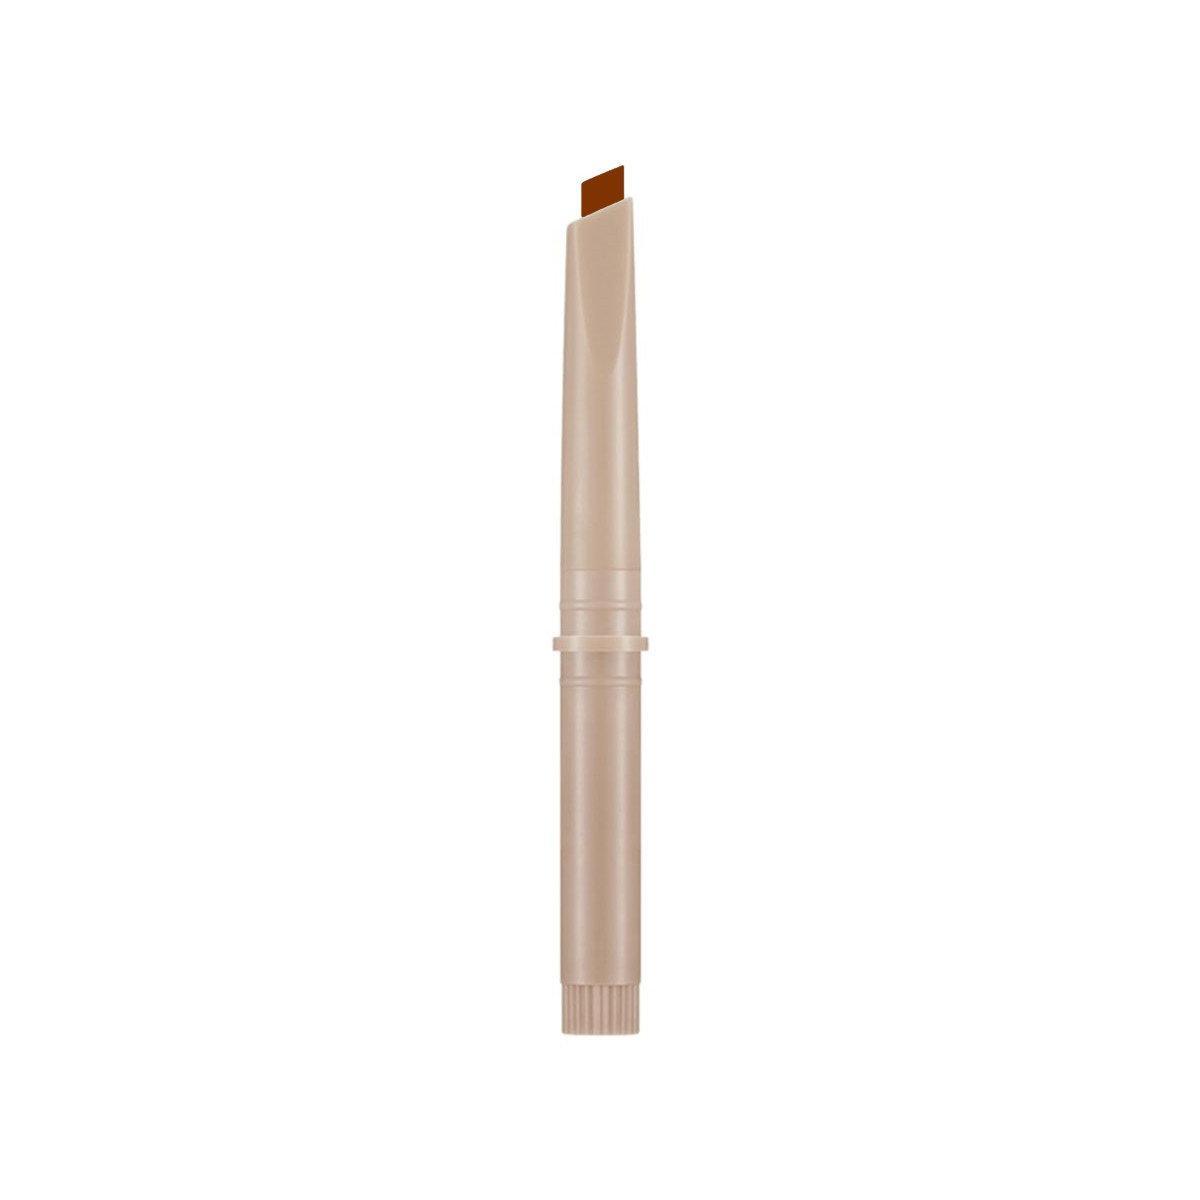 Сменный блок для автоматического карандаша для бровей Missha The Style Perfect Eyebrow Styler - Brown 0,35 г (8806185750011)